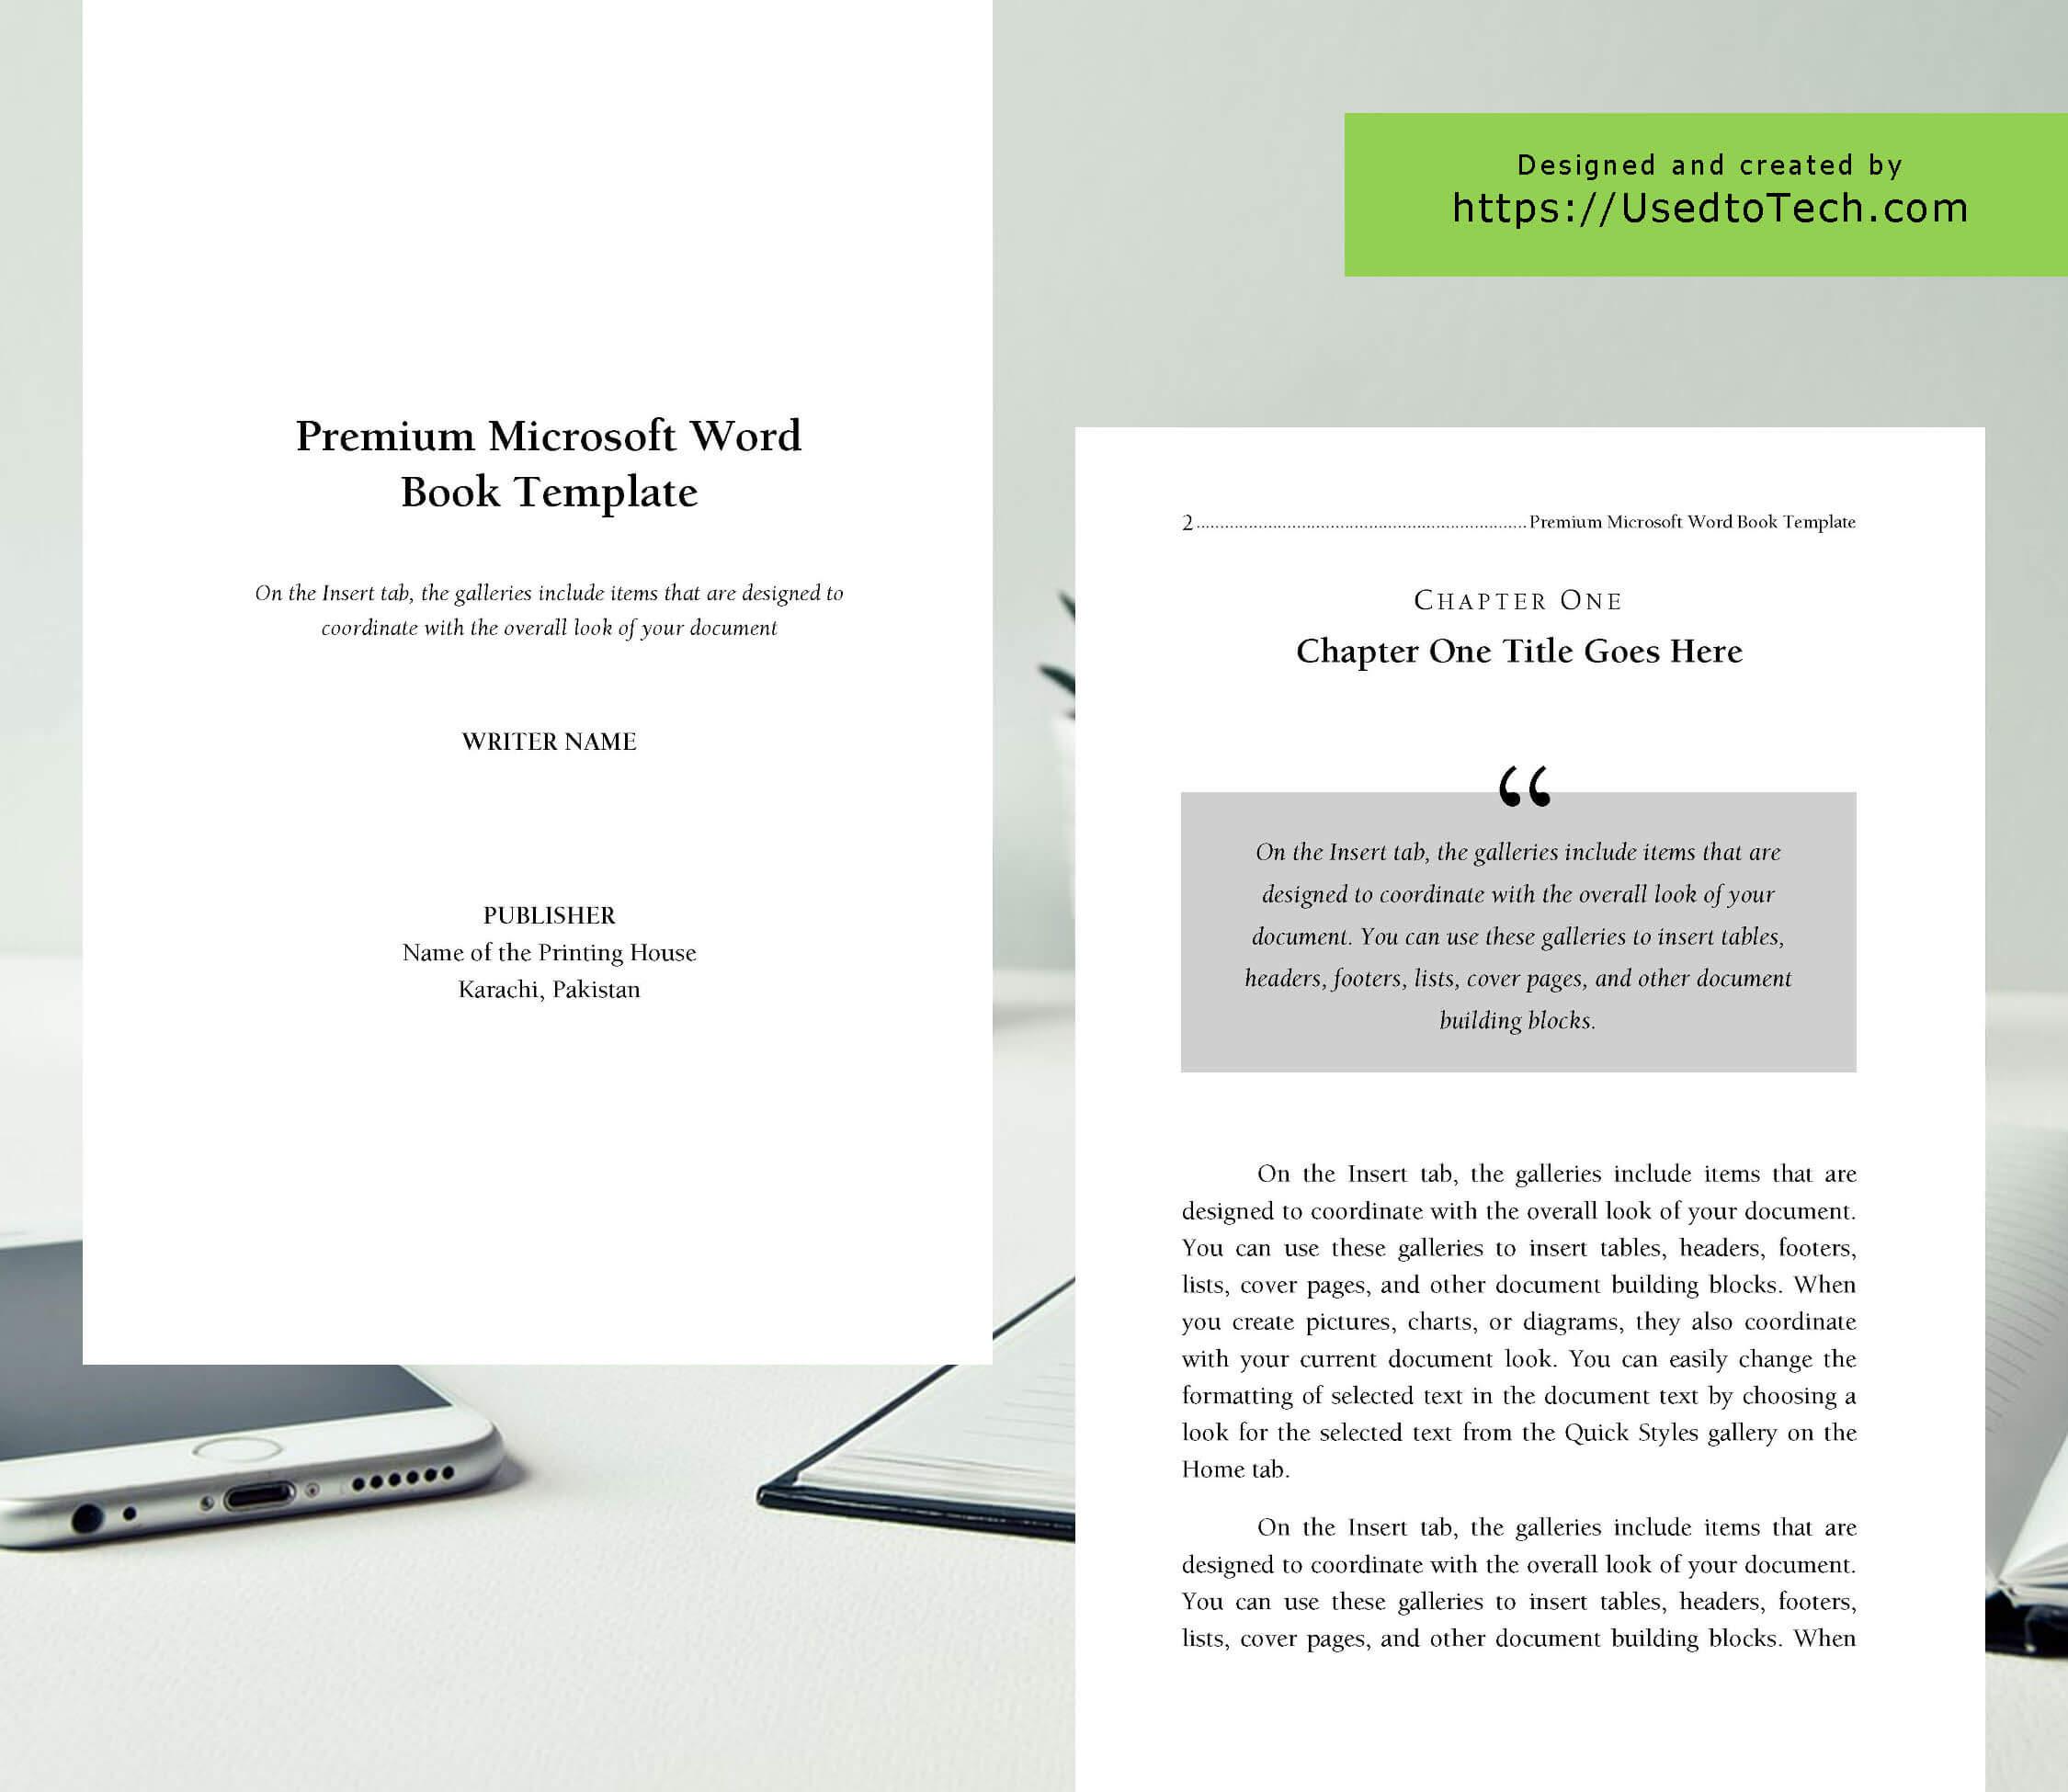 Premium & Free 6 X 9 Book Template For Microsoft Word - Used Regarding 6X9 Book Template For Word